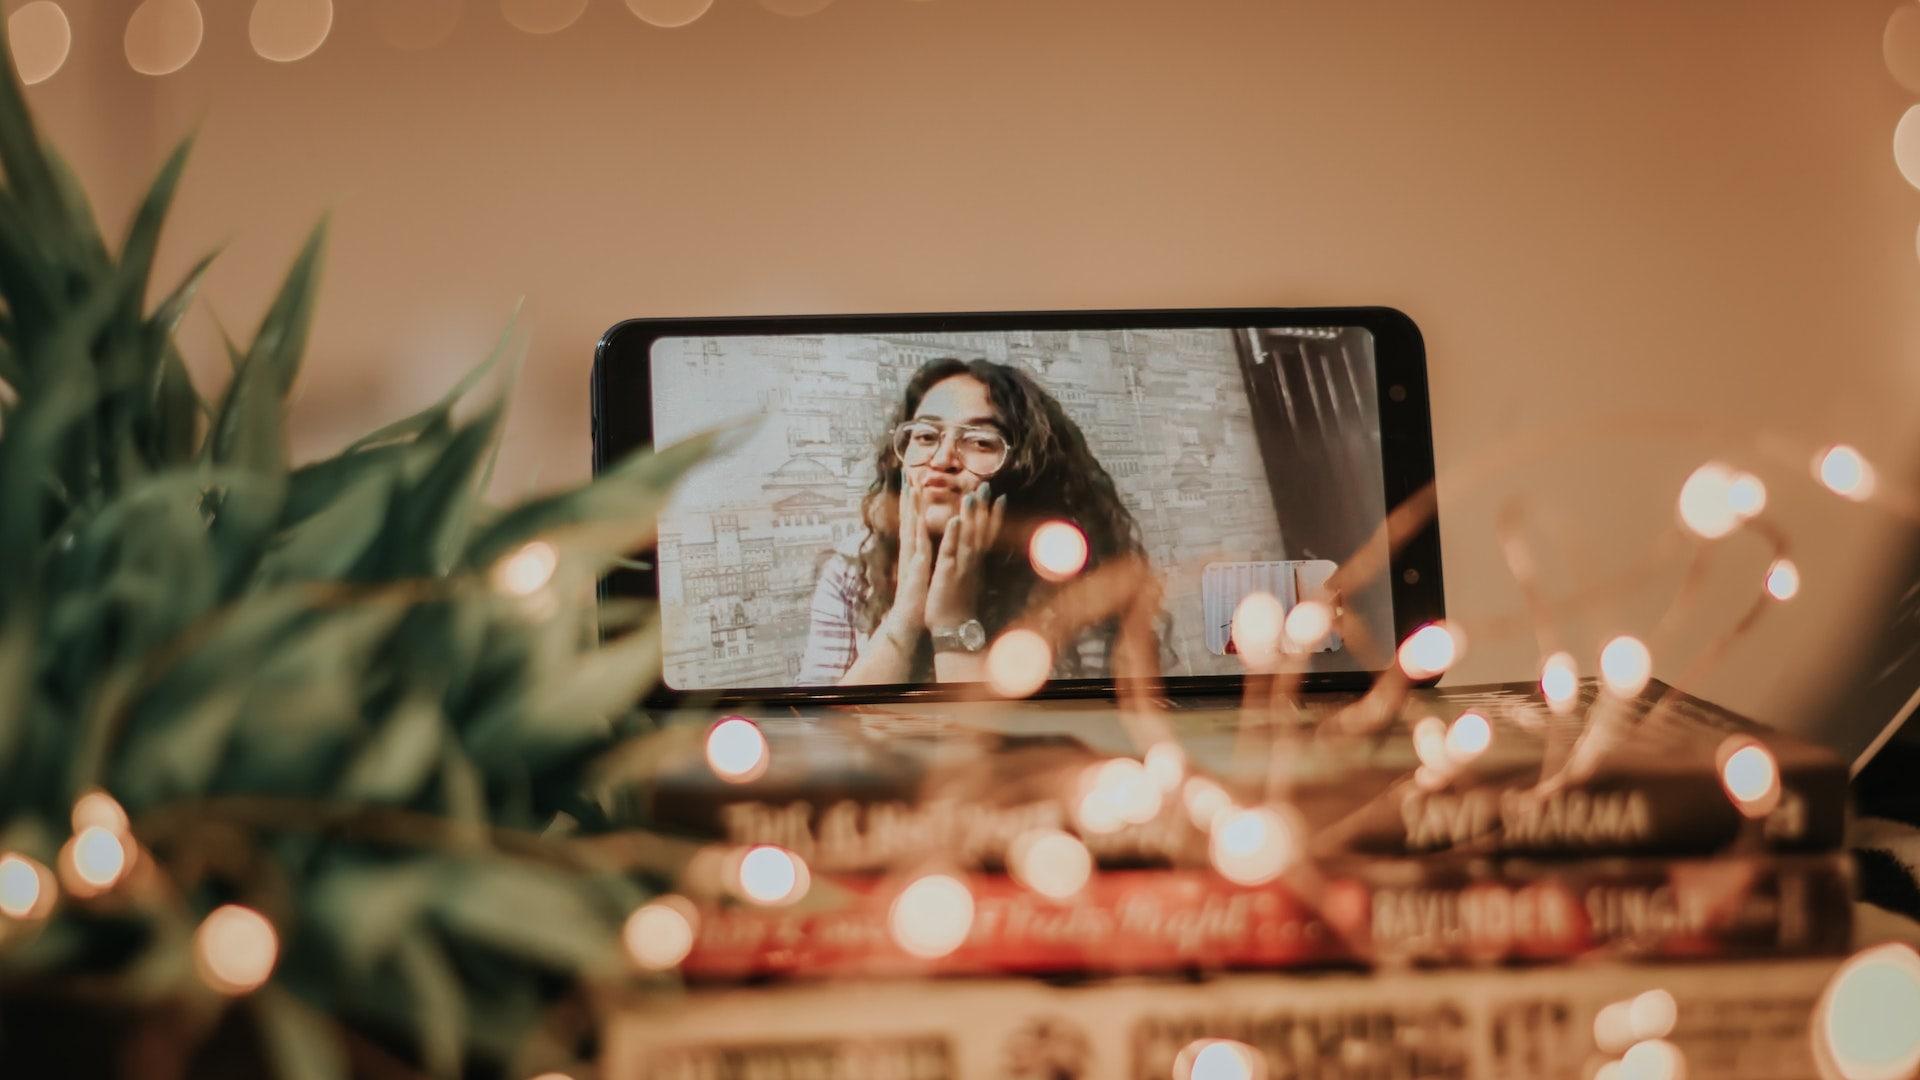 Apps videollamada